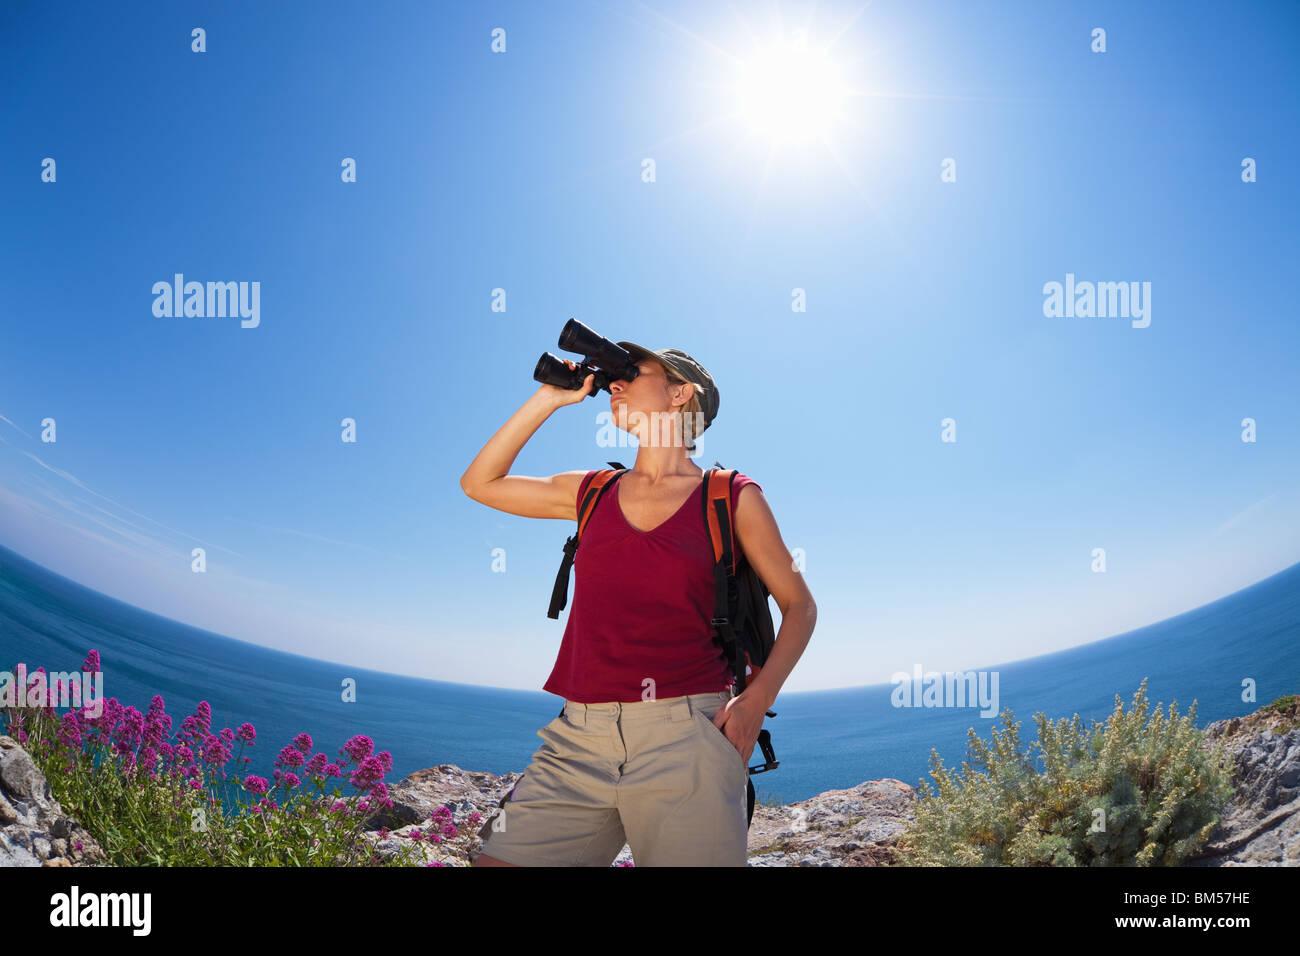 woman hiking and looking through binoculars - Stock Image